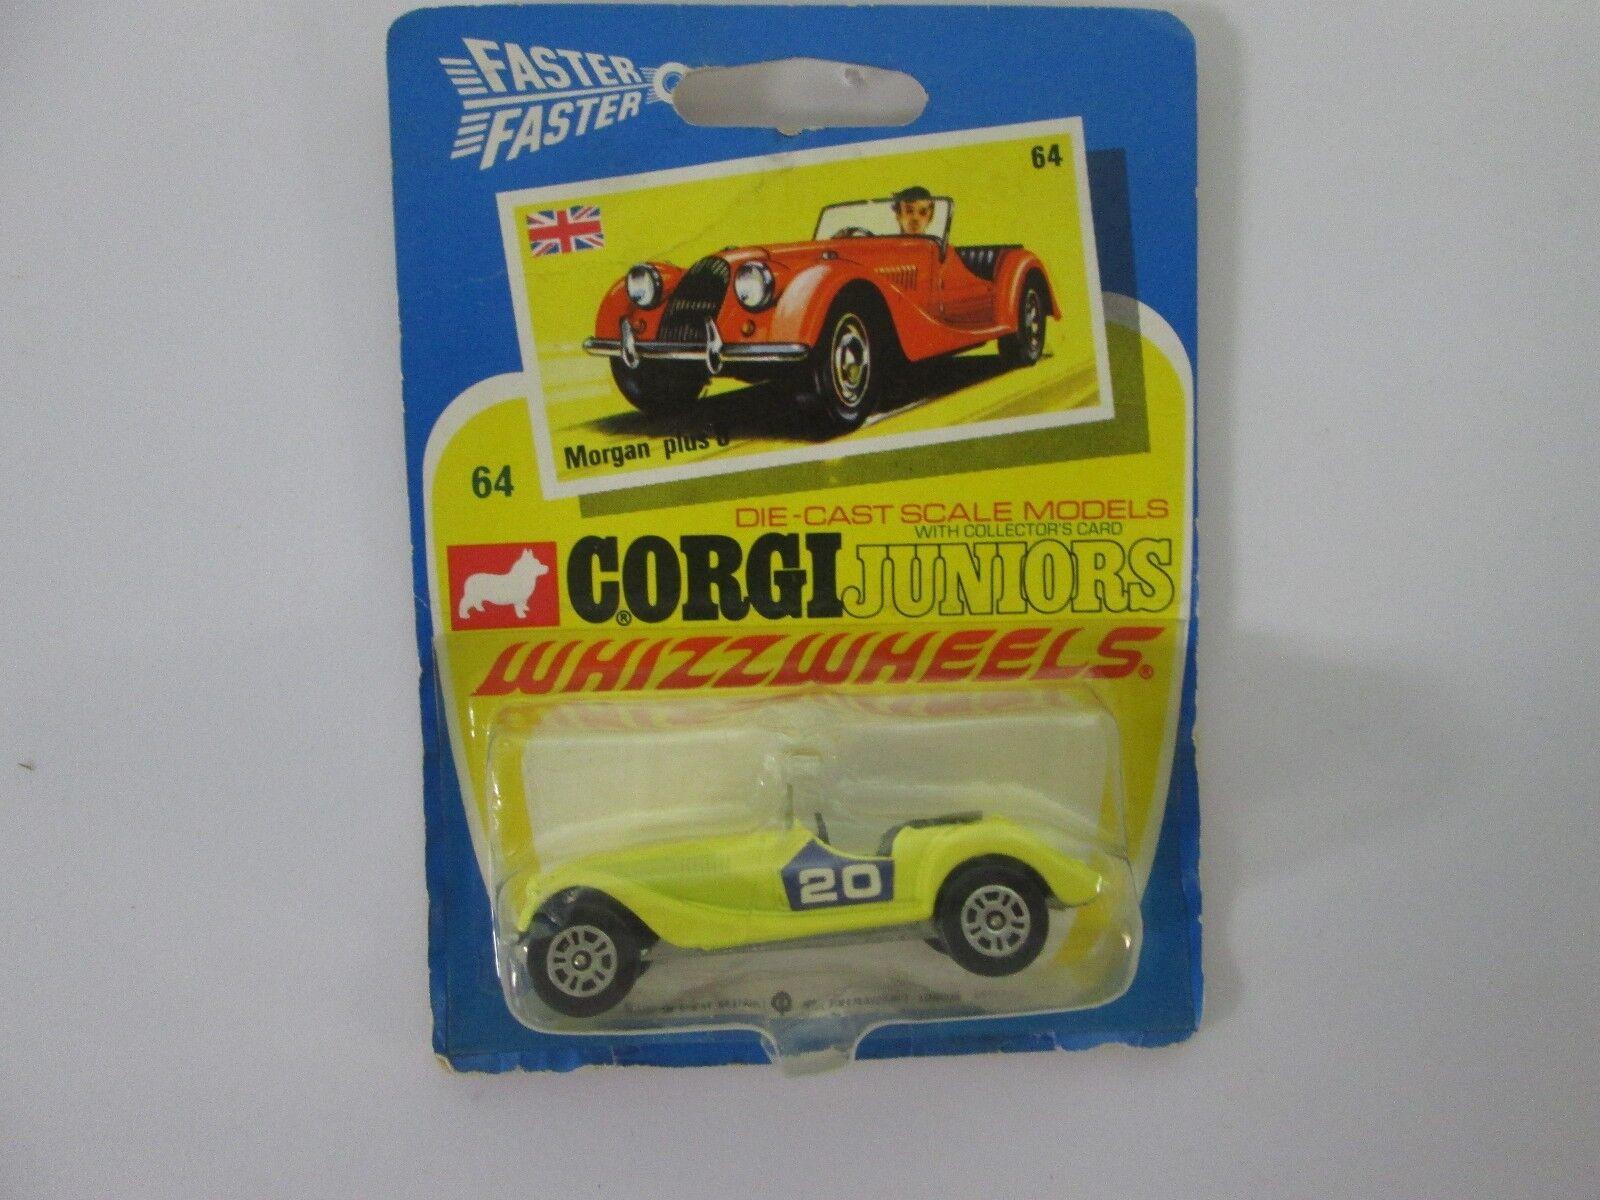 Vintage Corgi Juniors WhizzWheels Morgan Plus 8